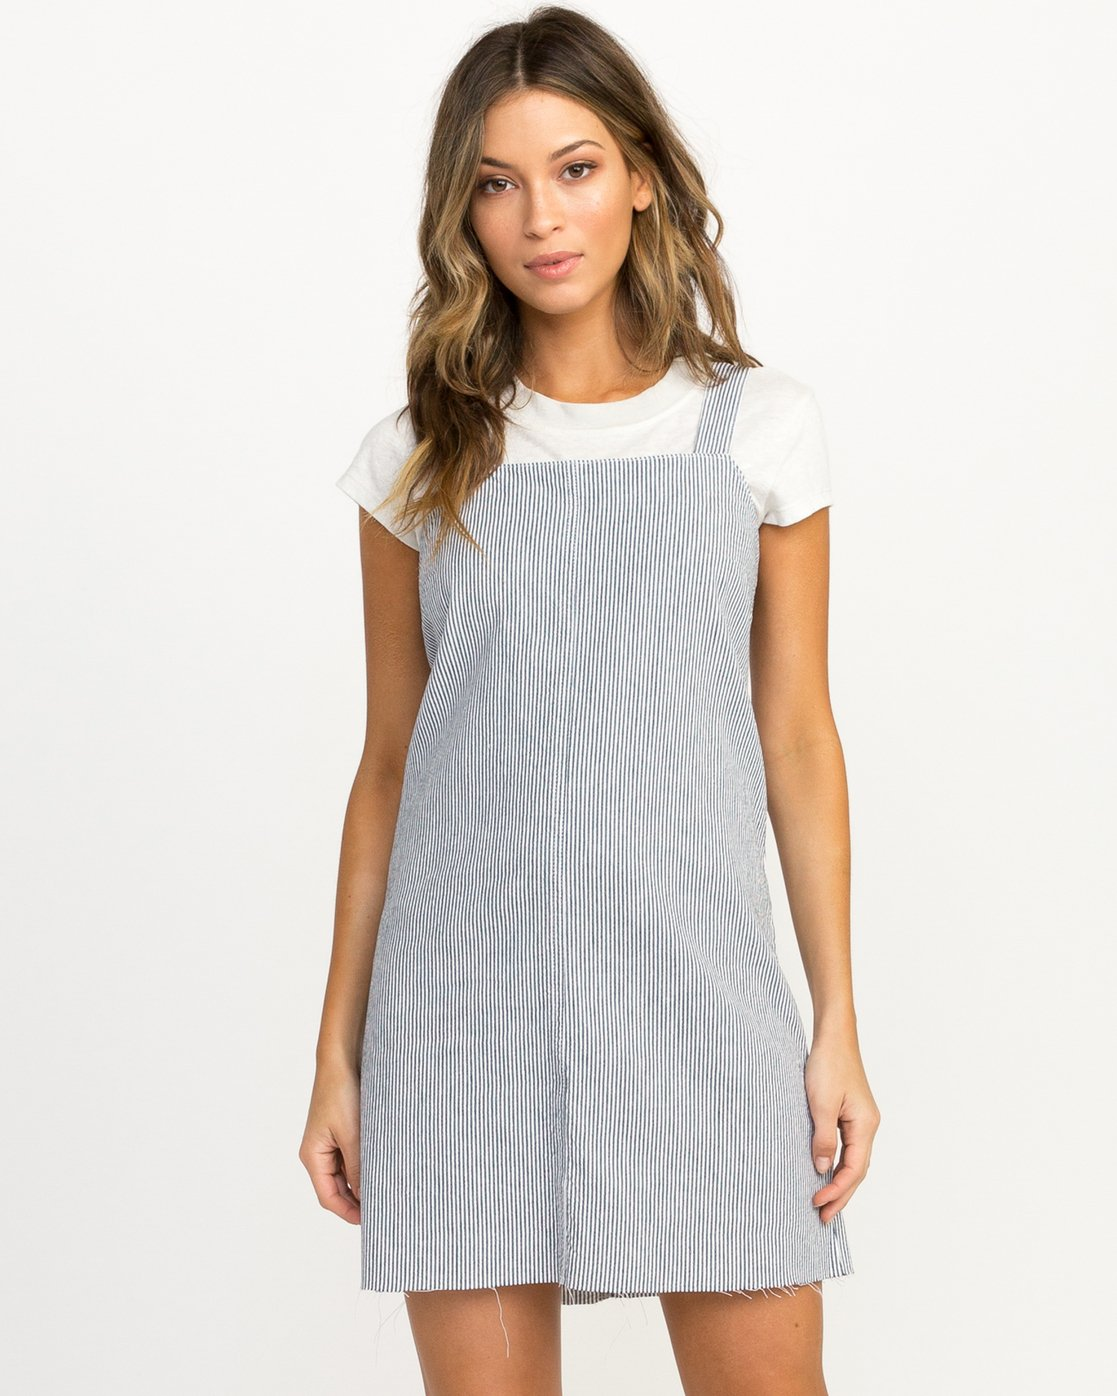 0 Tide Shift Striped Dress Silver WD18QRTI RVCA